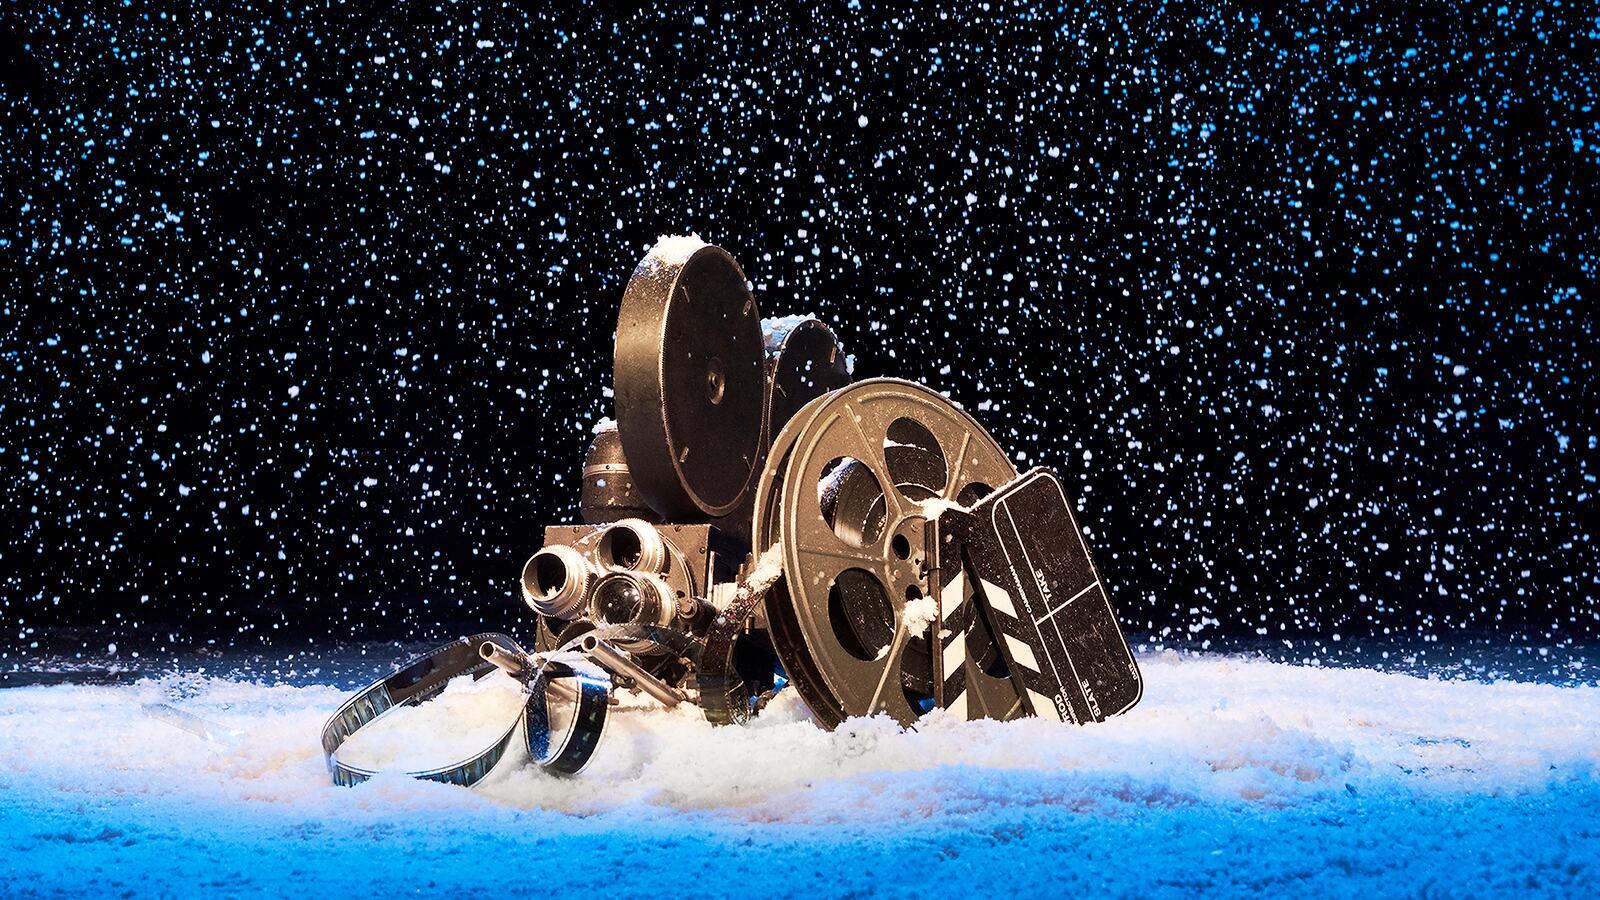 A reel of film sitting in snow